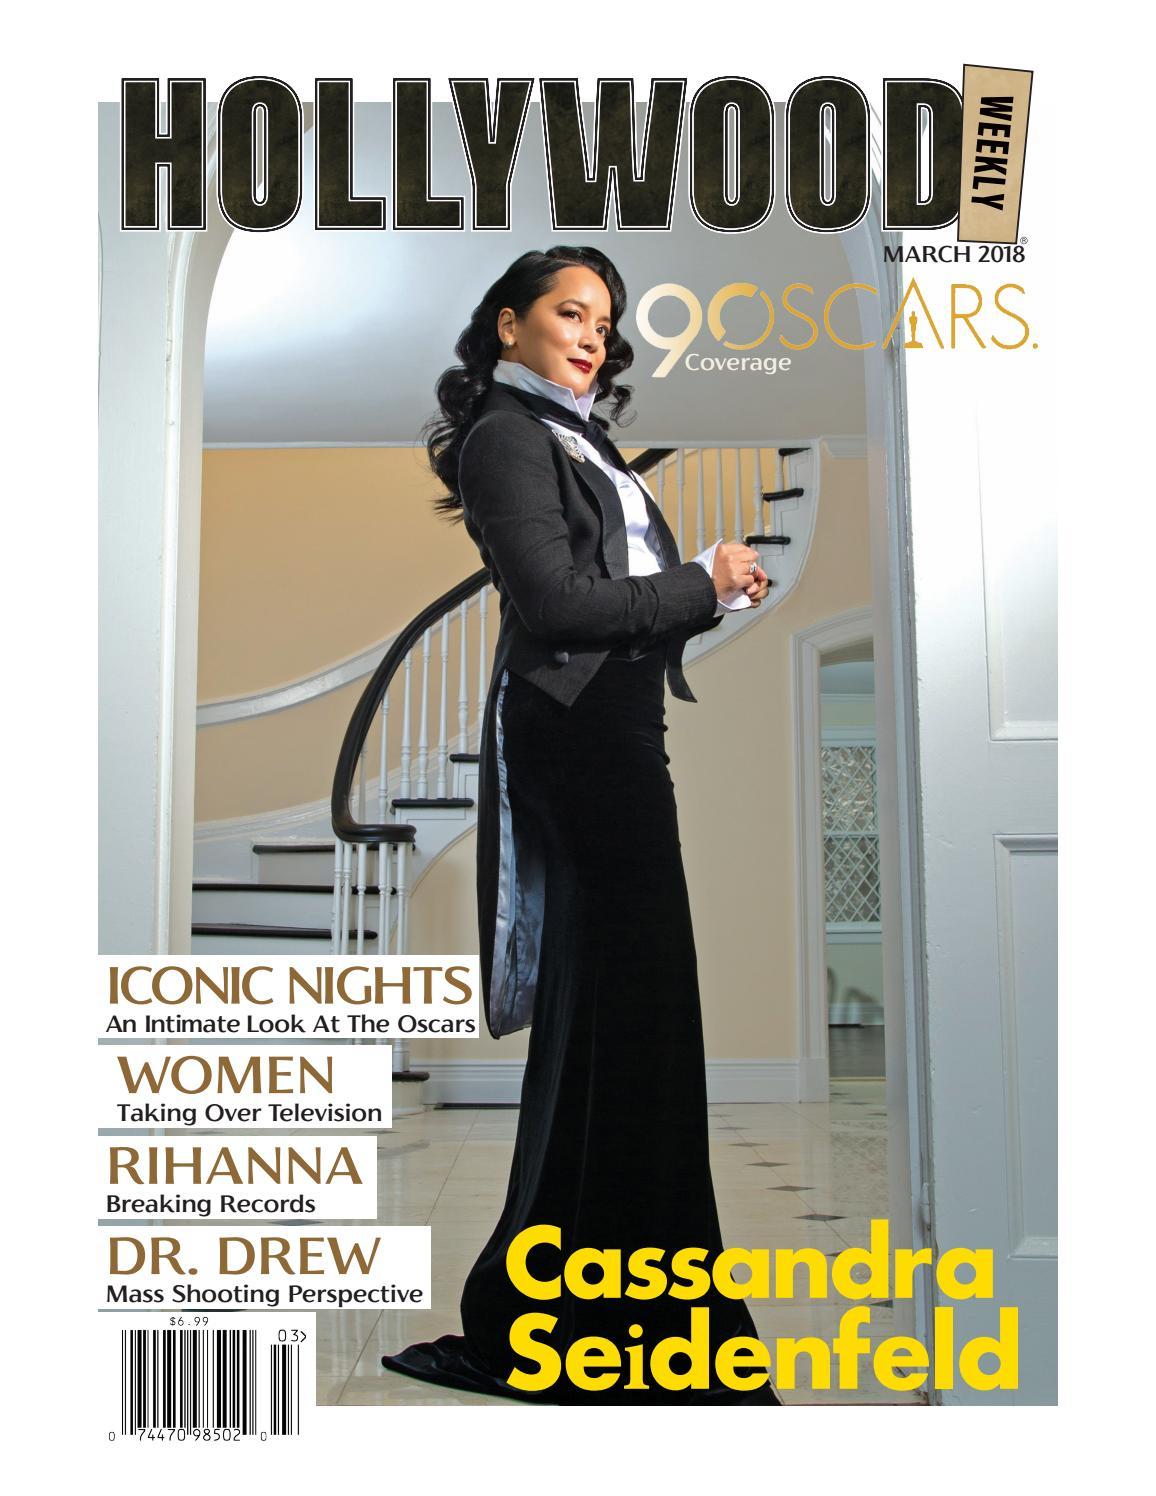 5cf0eb831df 2018 Academy Awards Featuring Cassandra Seidenfeld by Hollywood ...